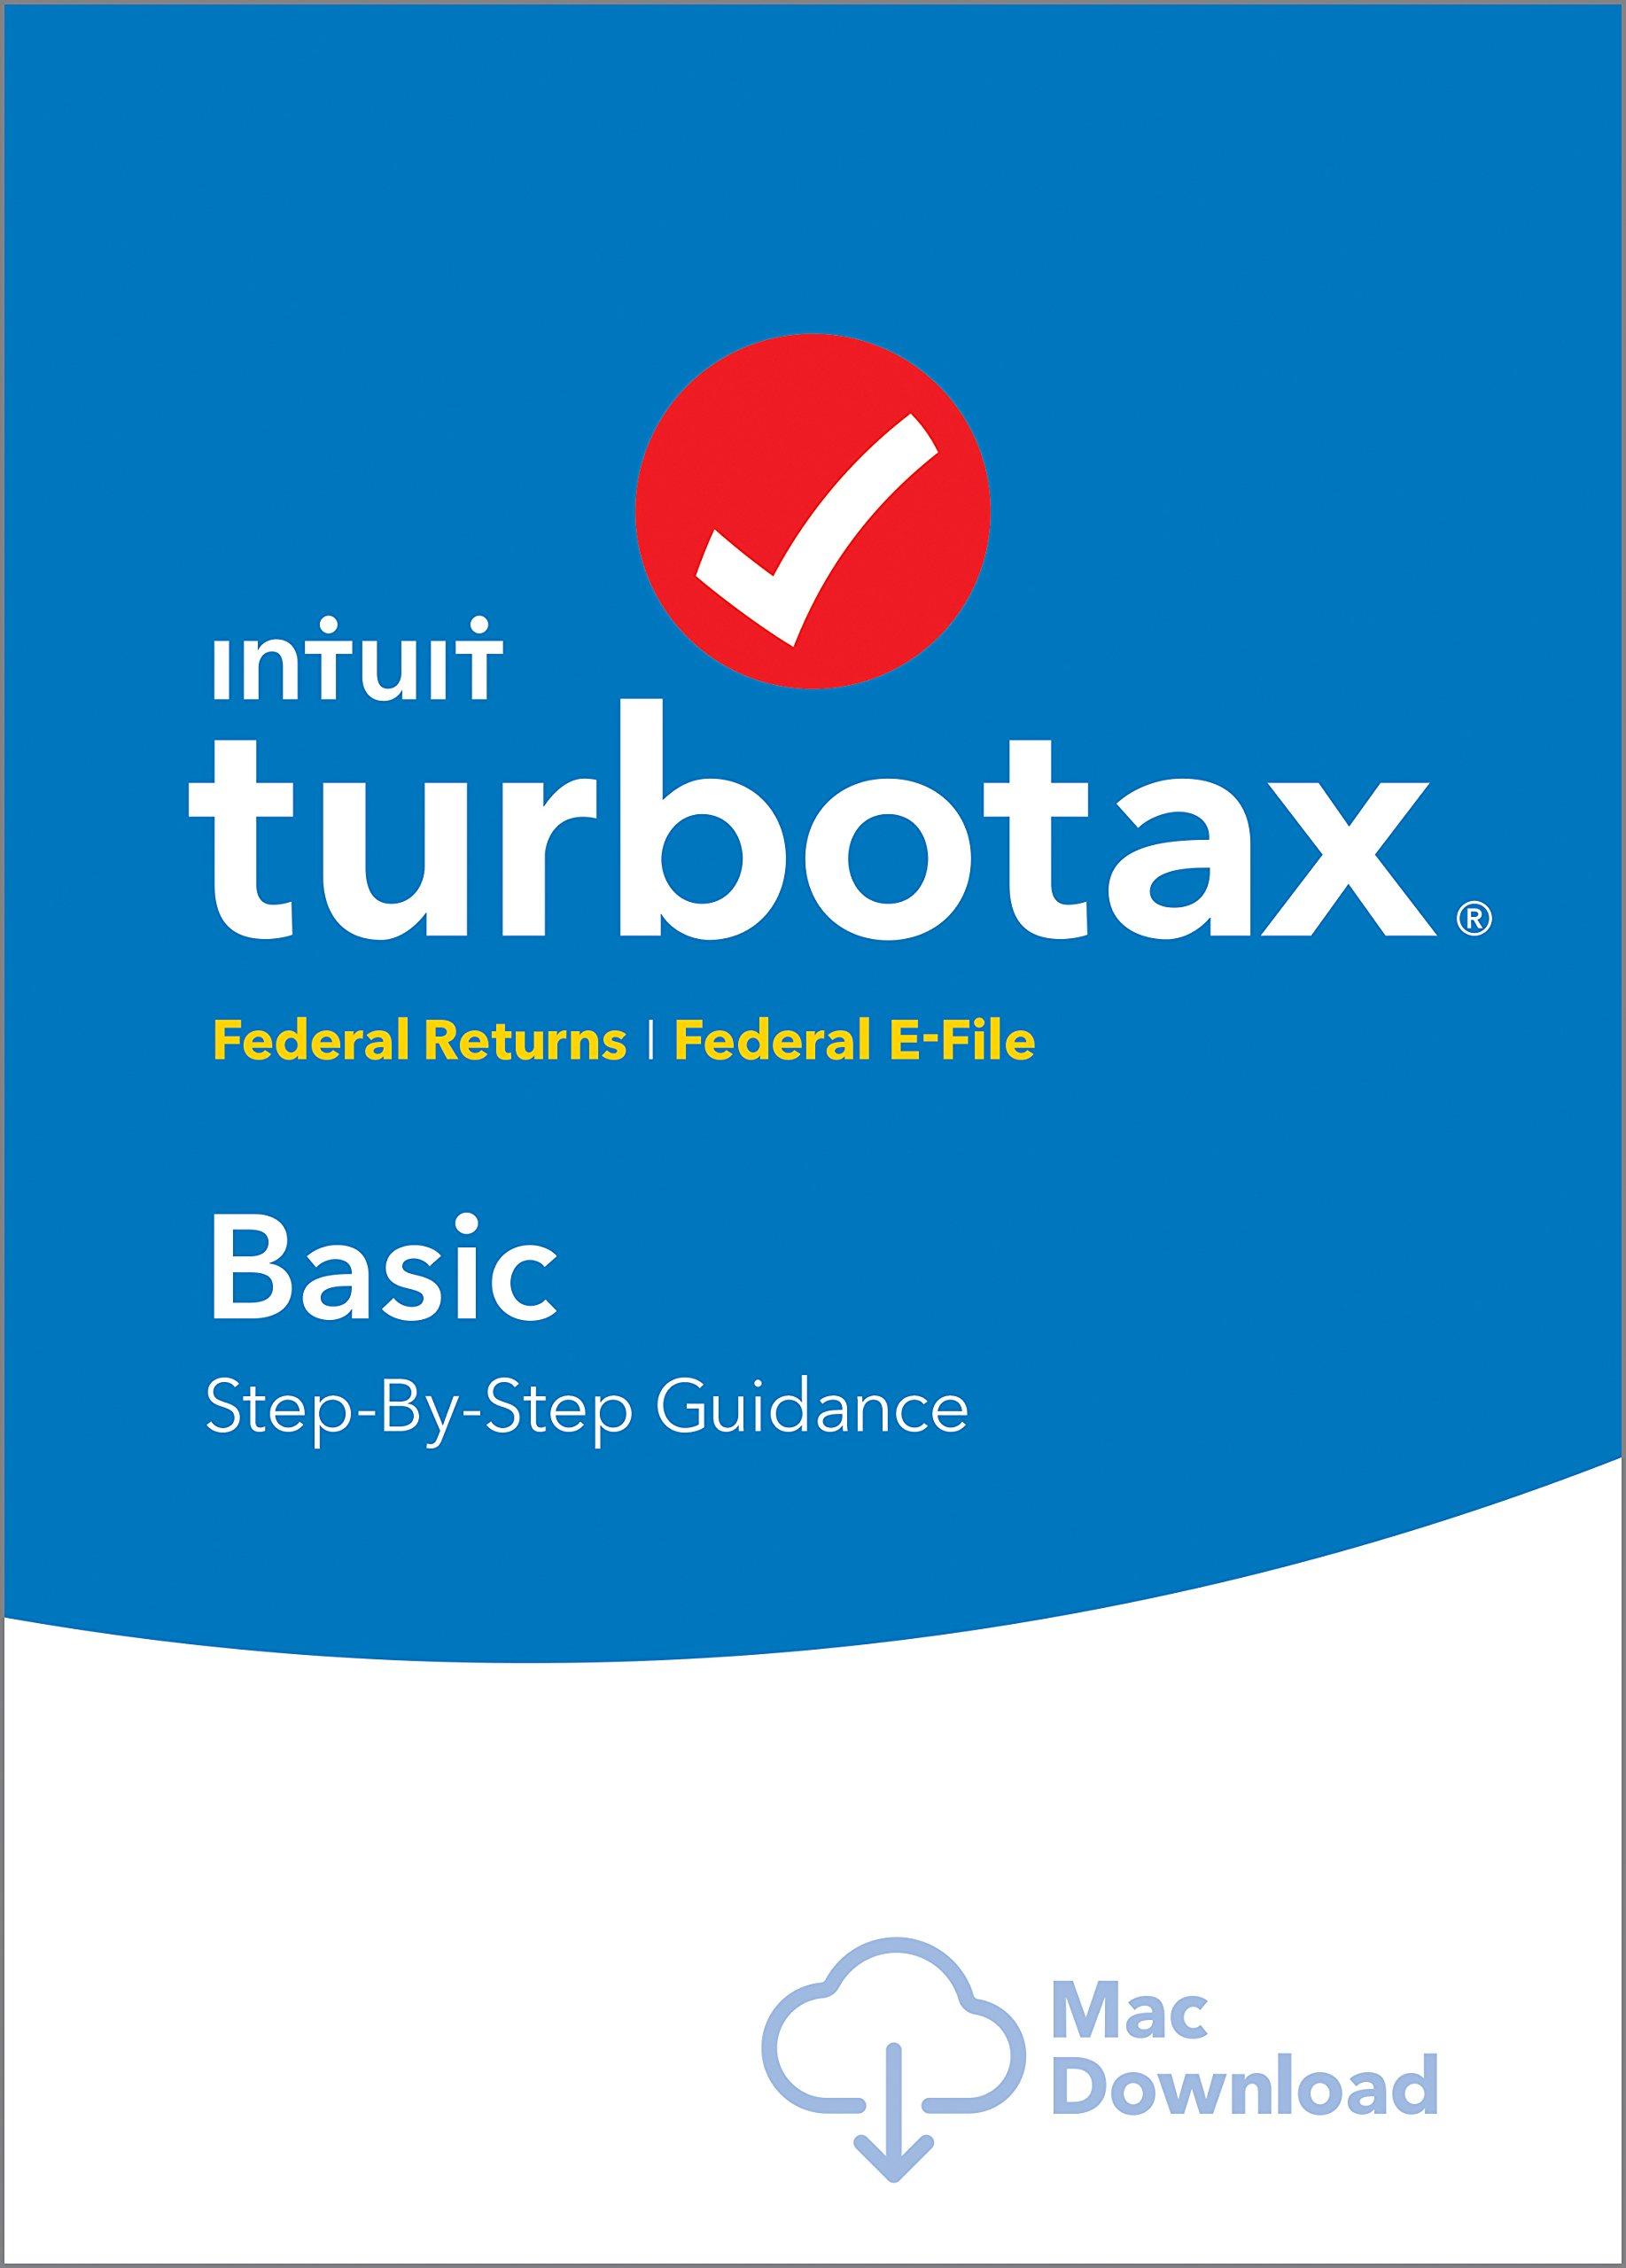 TurboTax Business 2018 Fed Efile